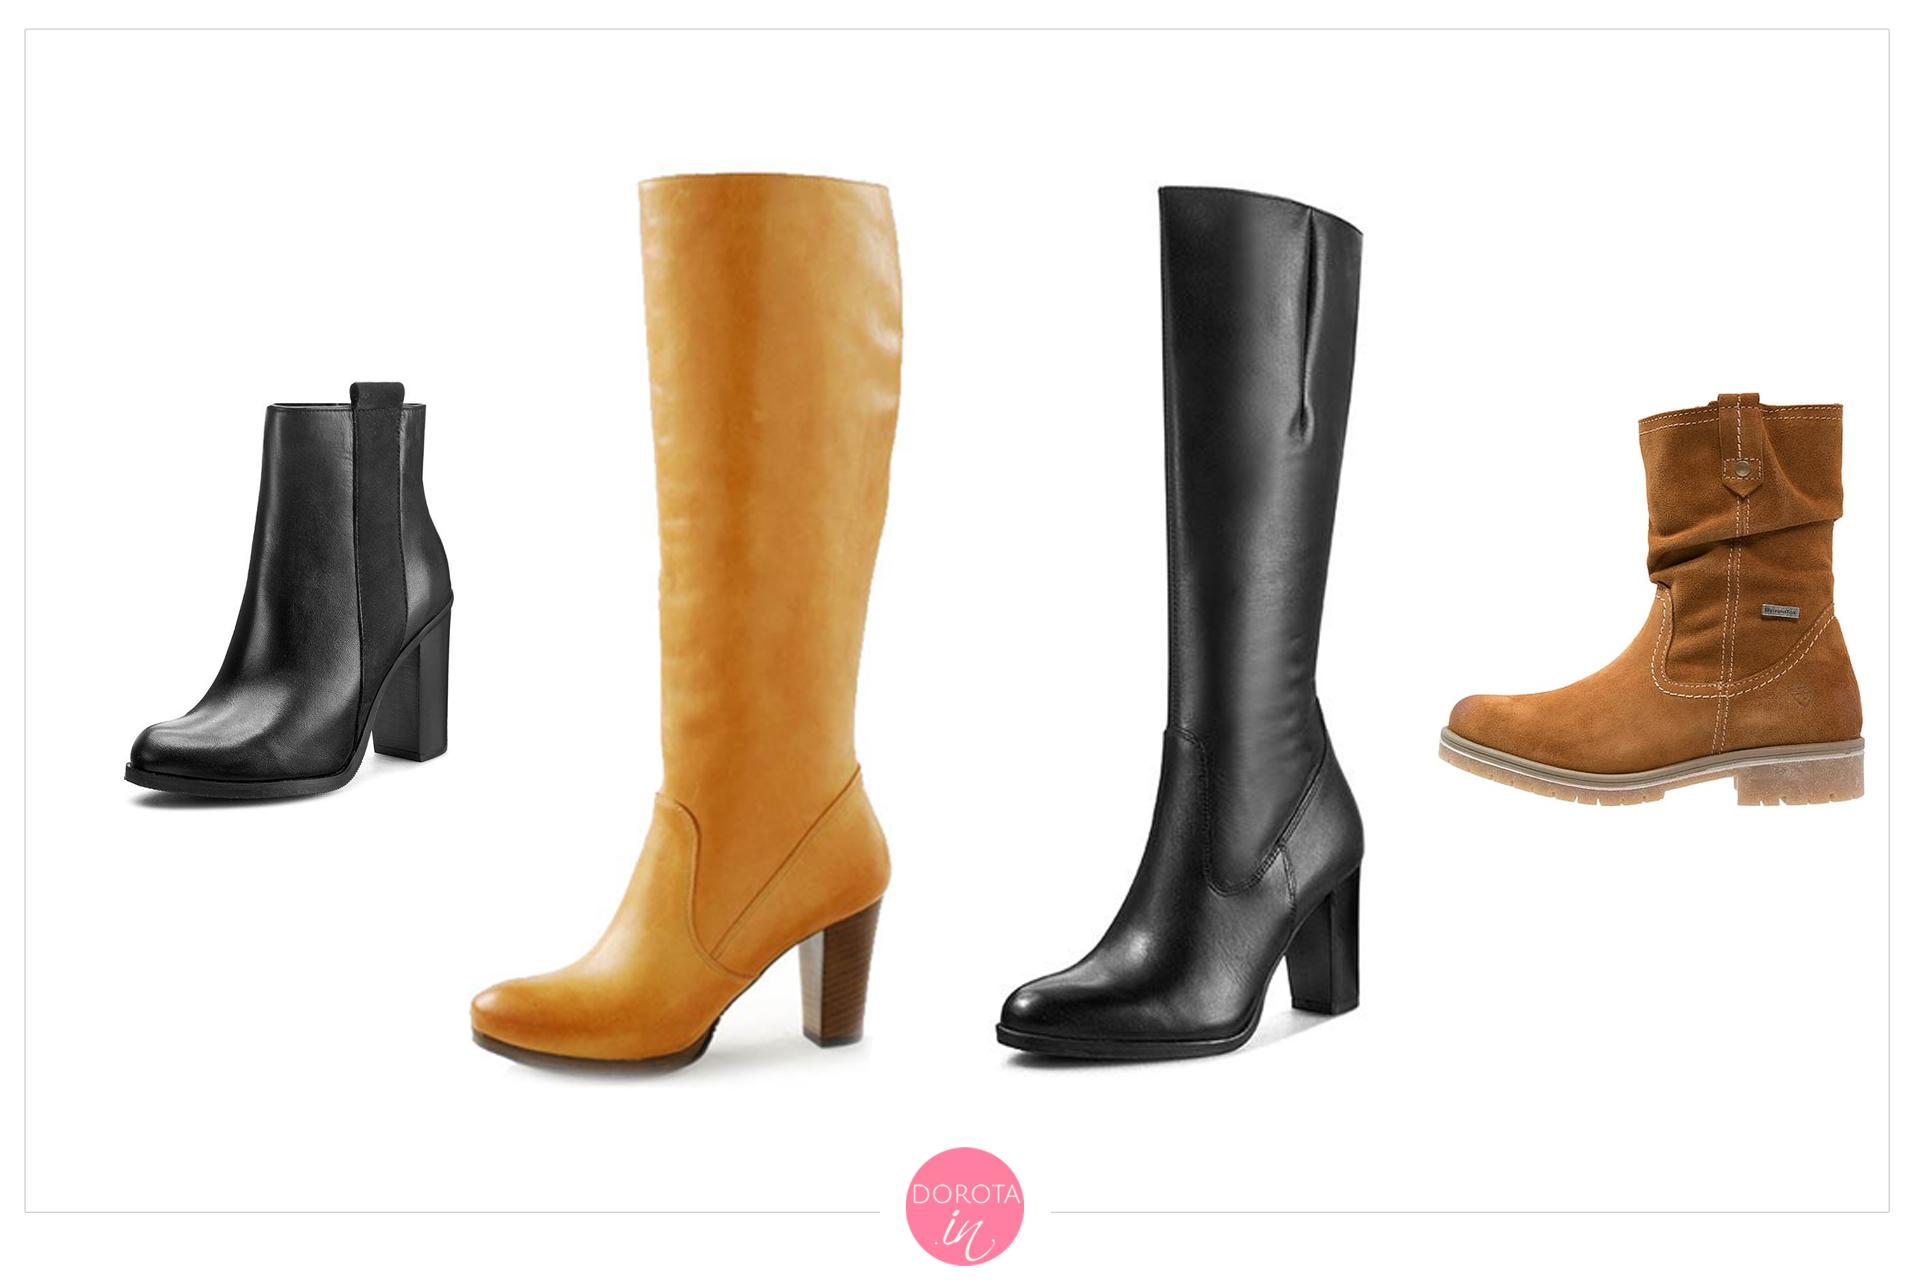 Buty na zimę - garderoba kapsułowa